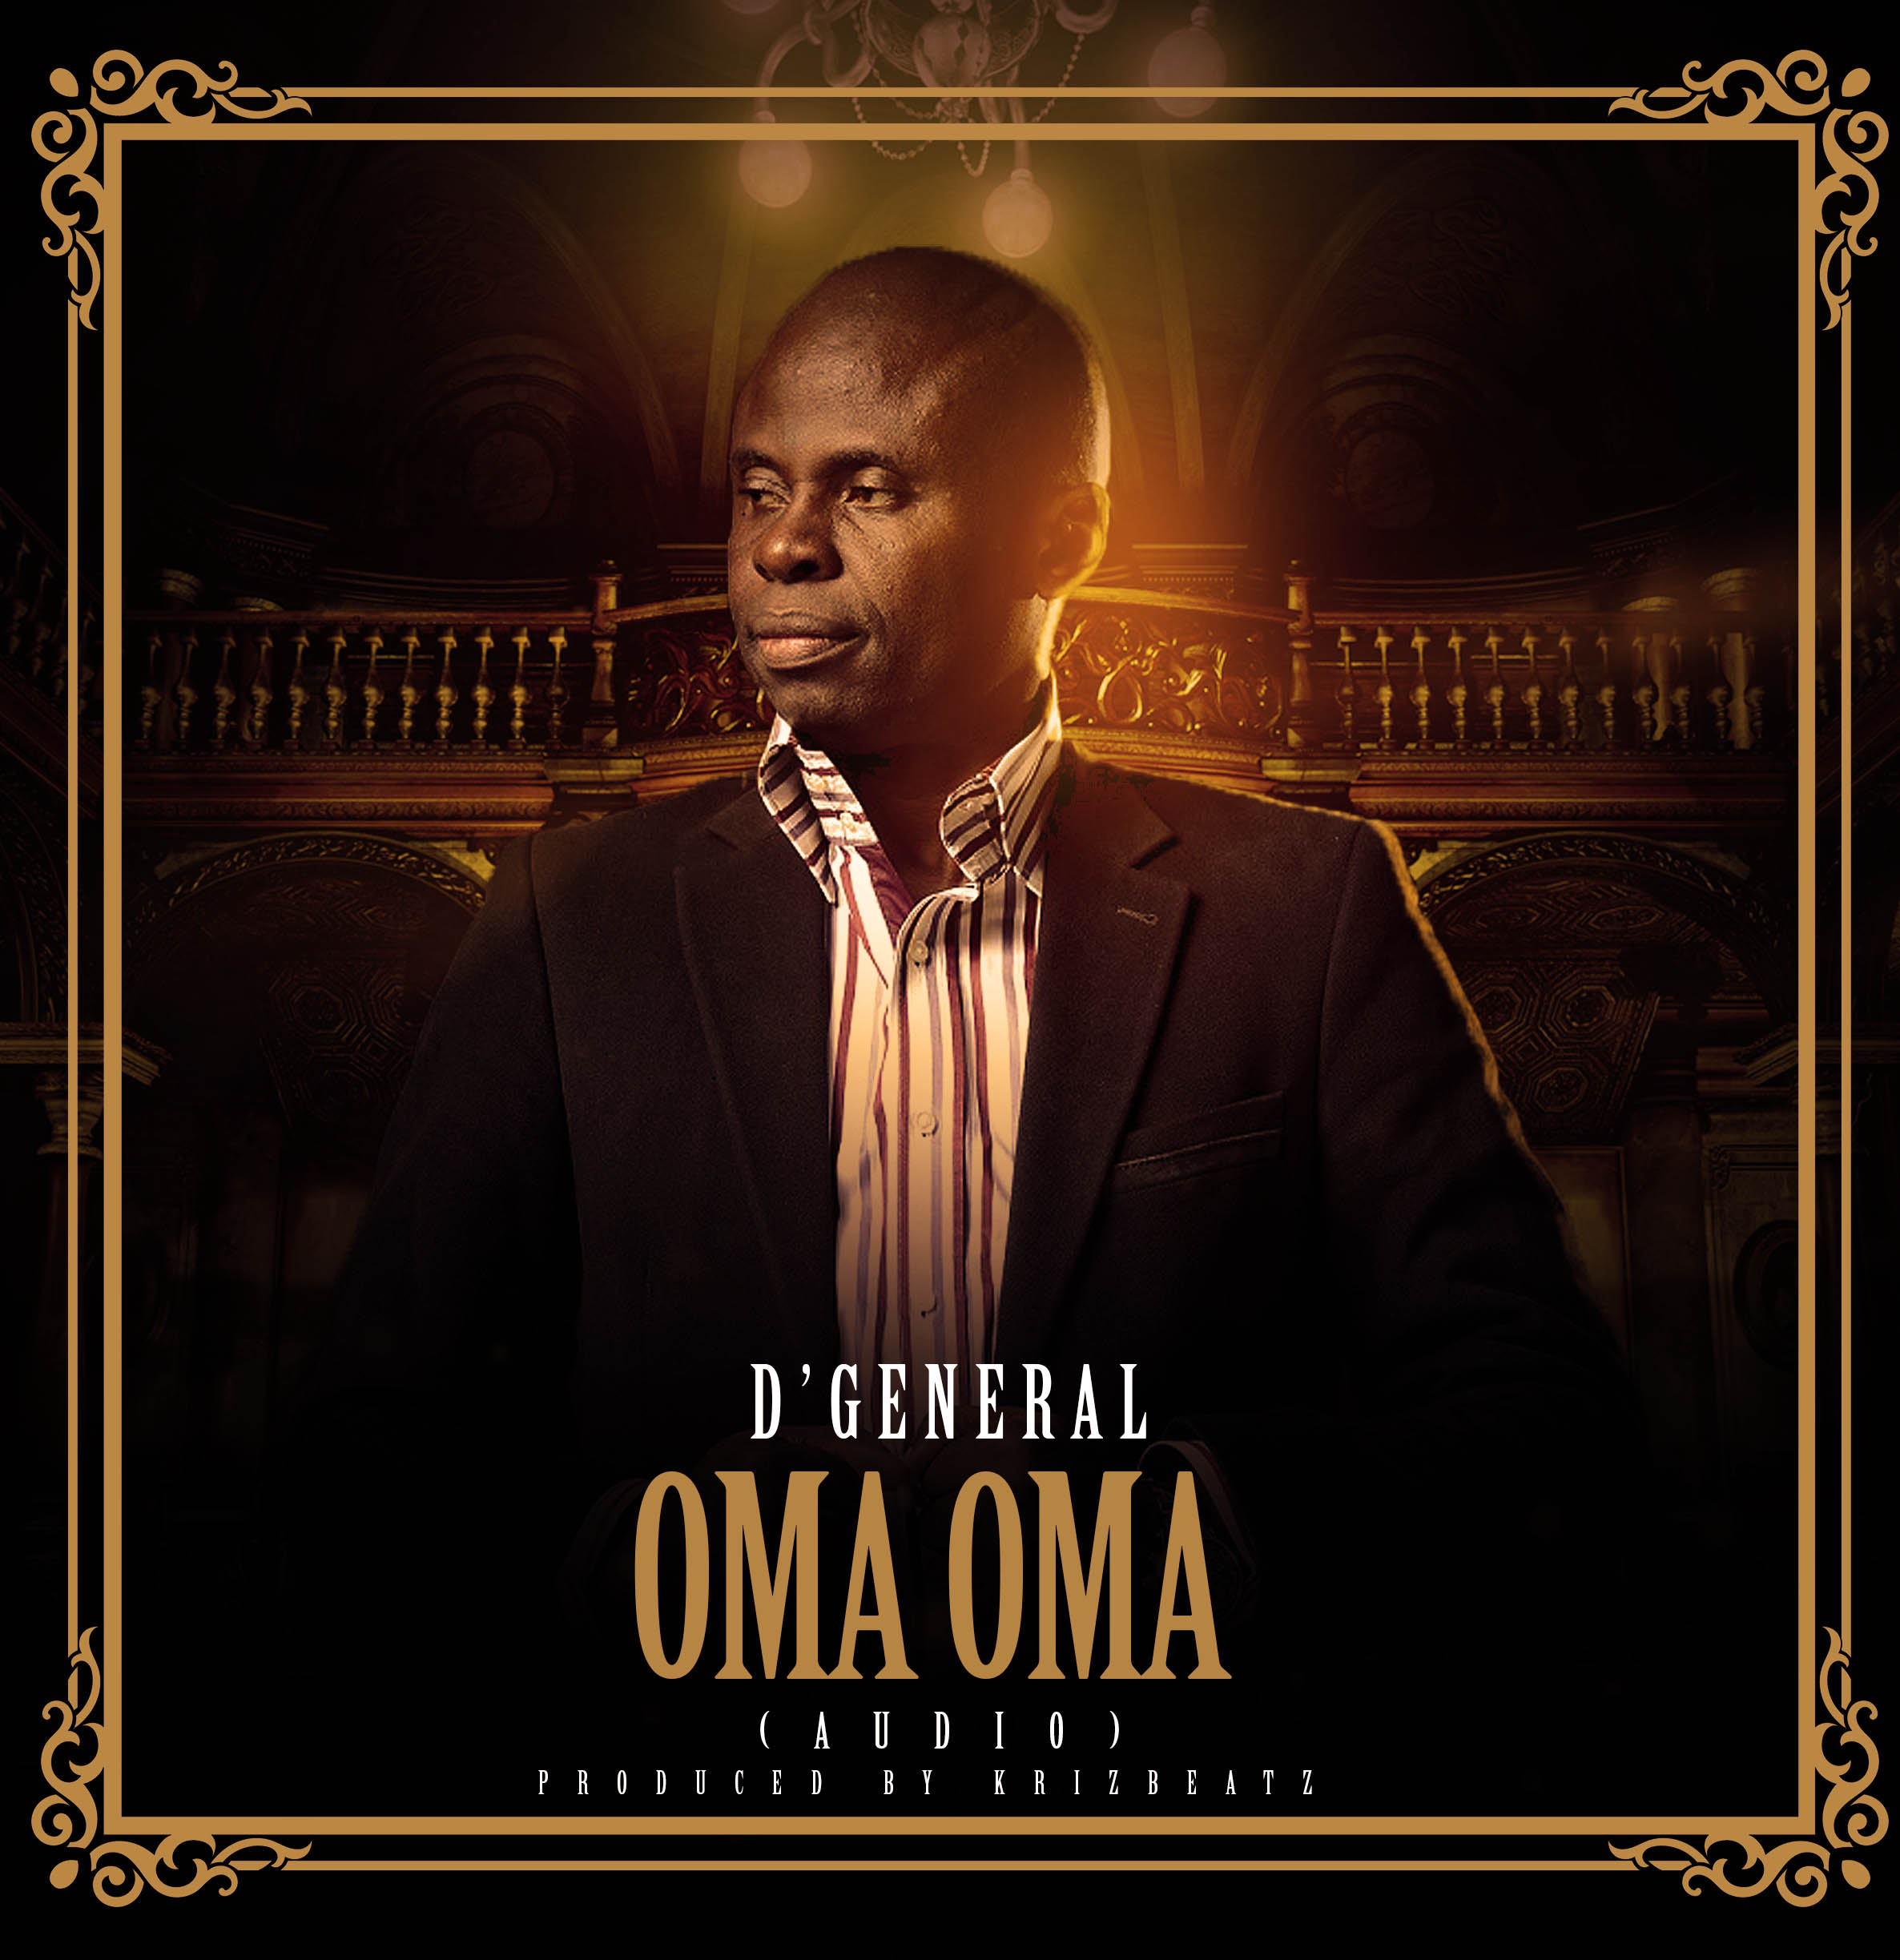 D'GENERAL – Oma Oma (Prod. by Krizbeatz)